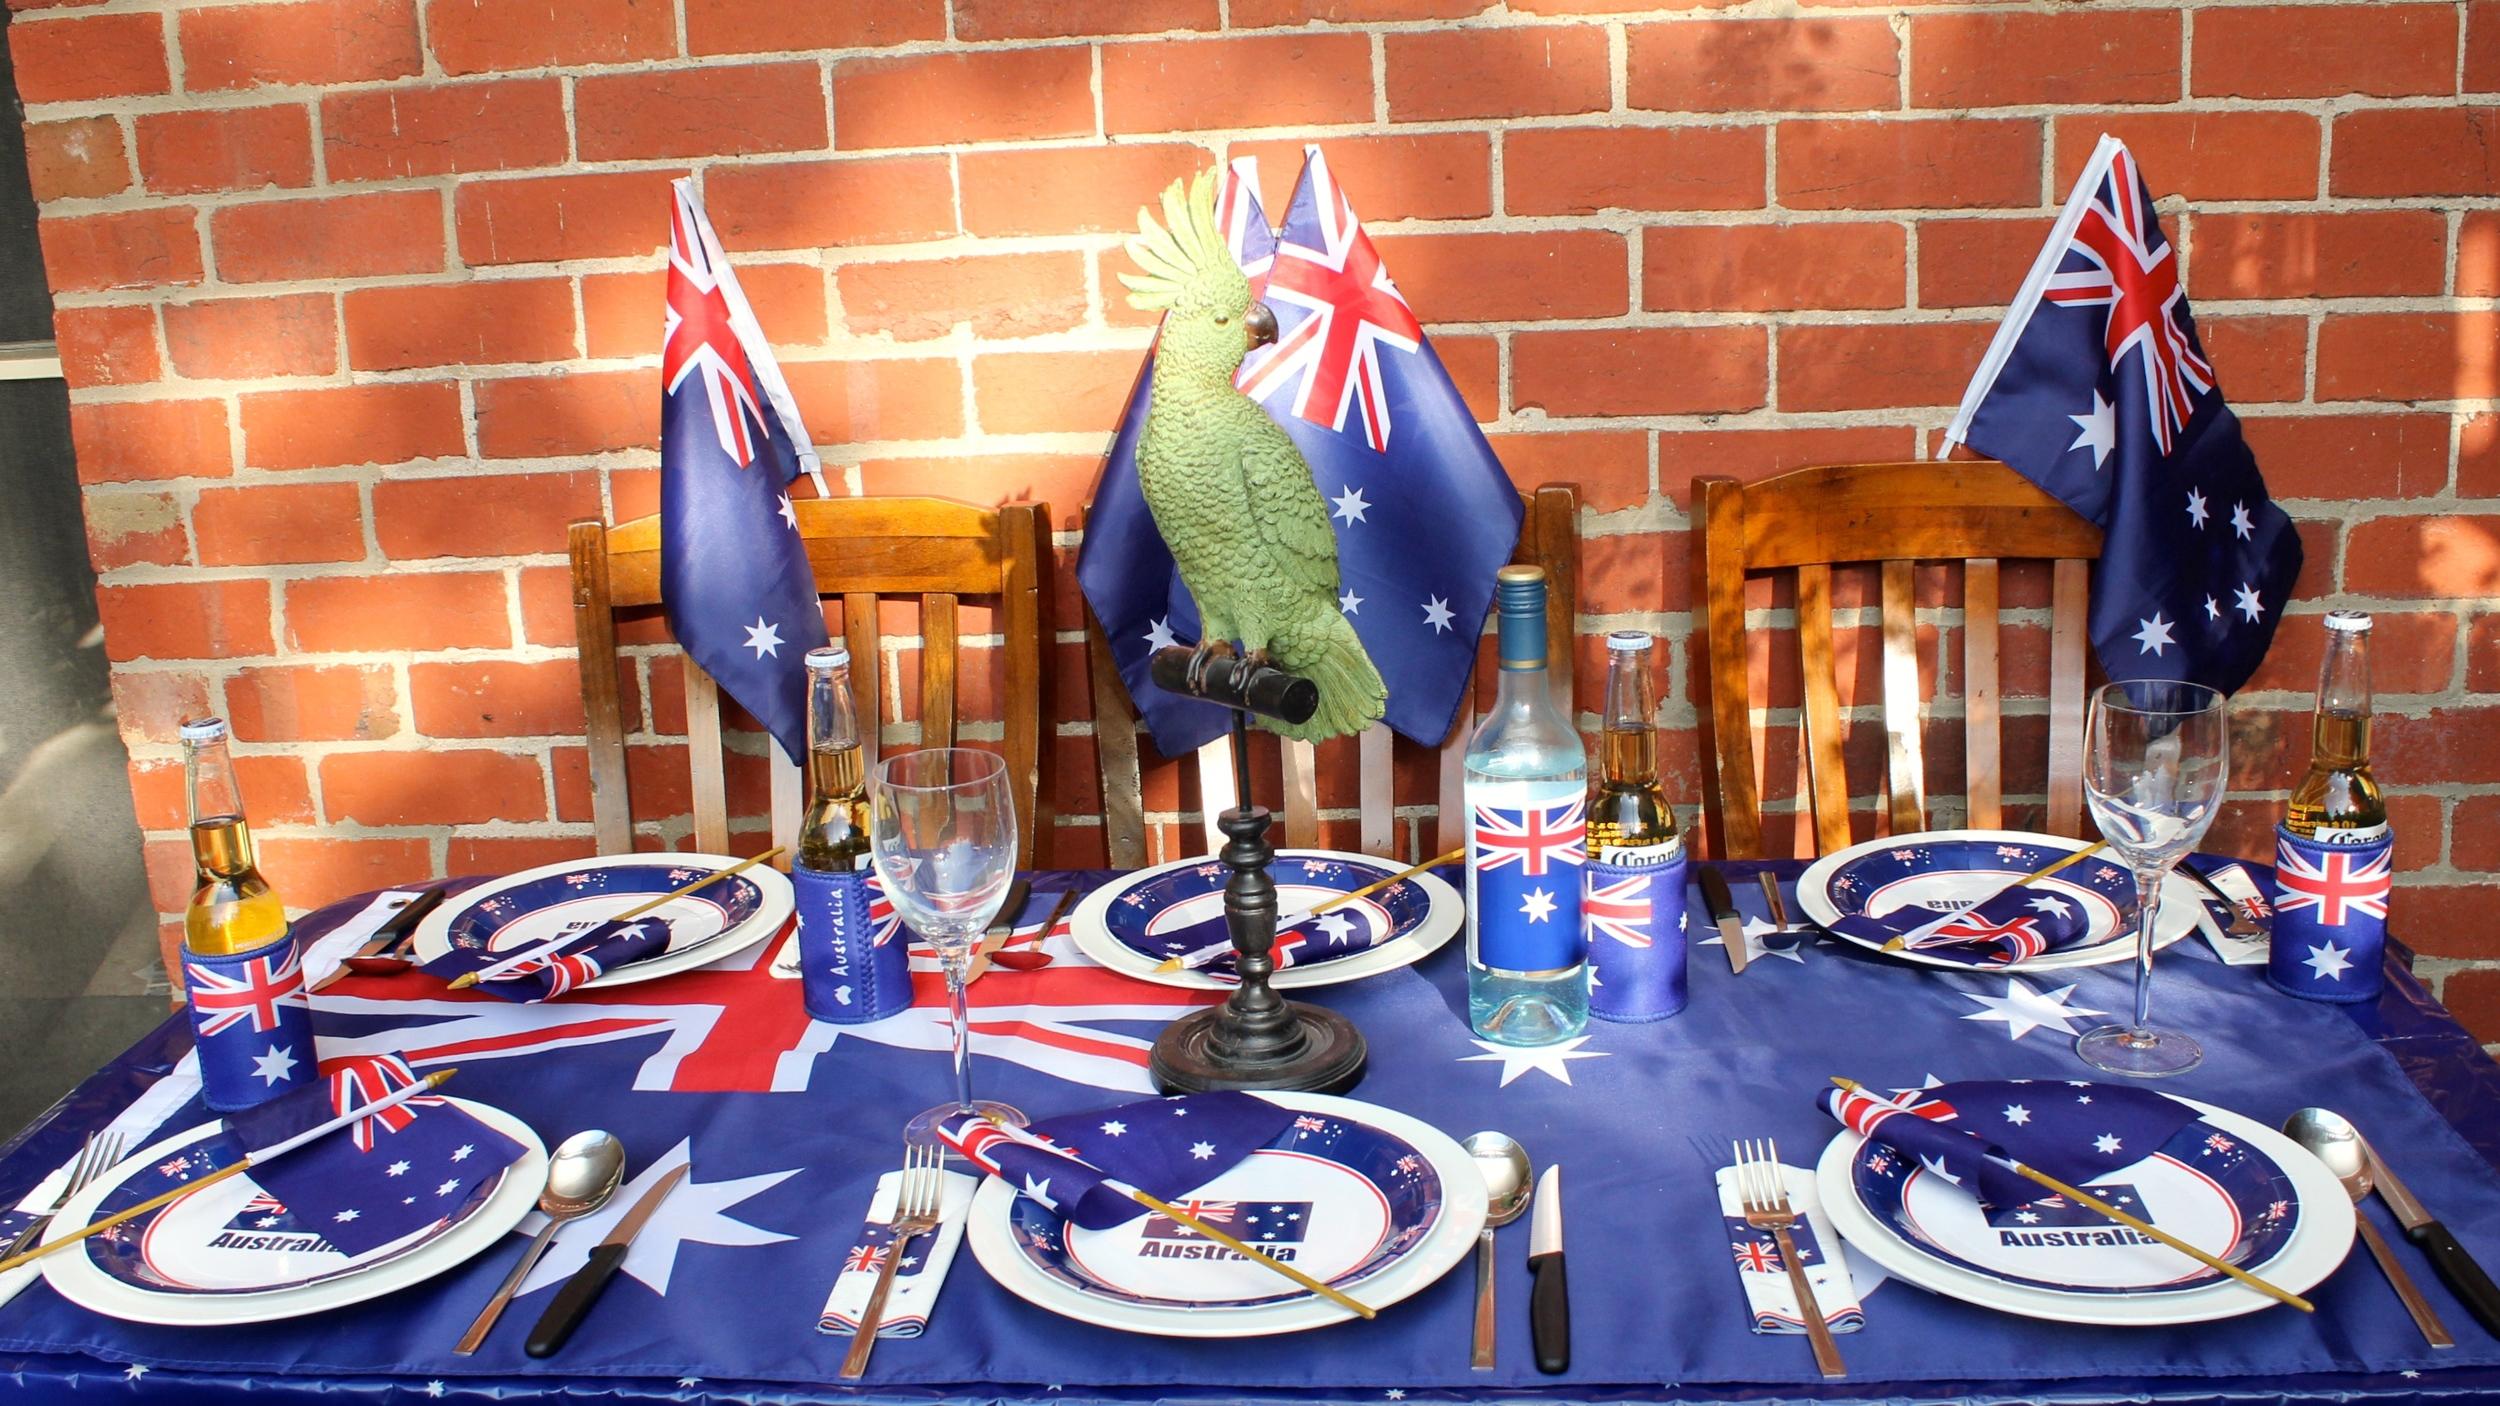 Australia Day Table Setting